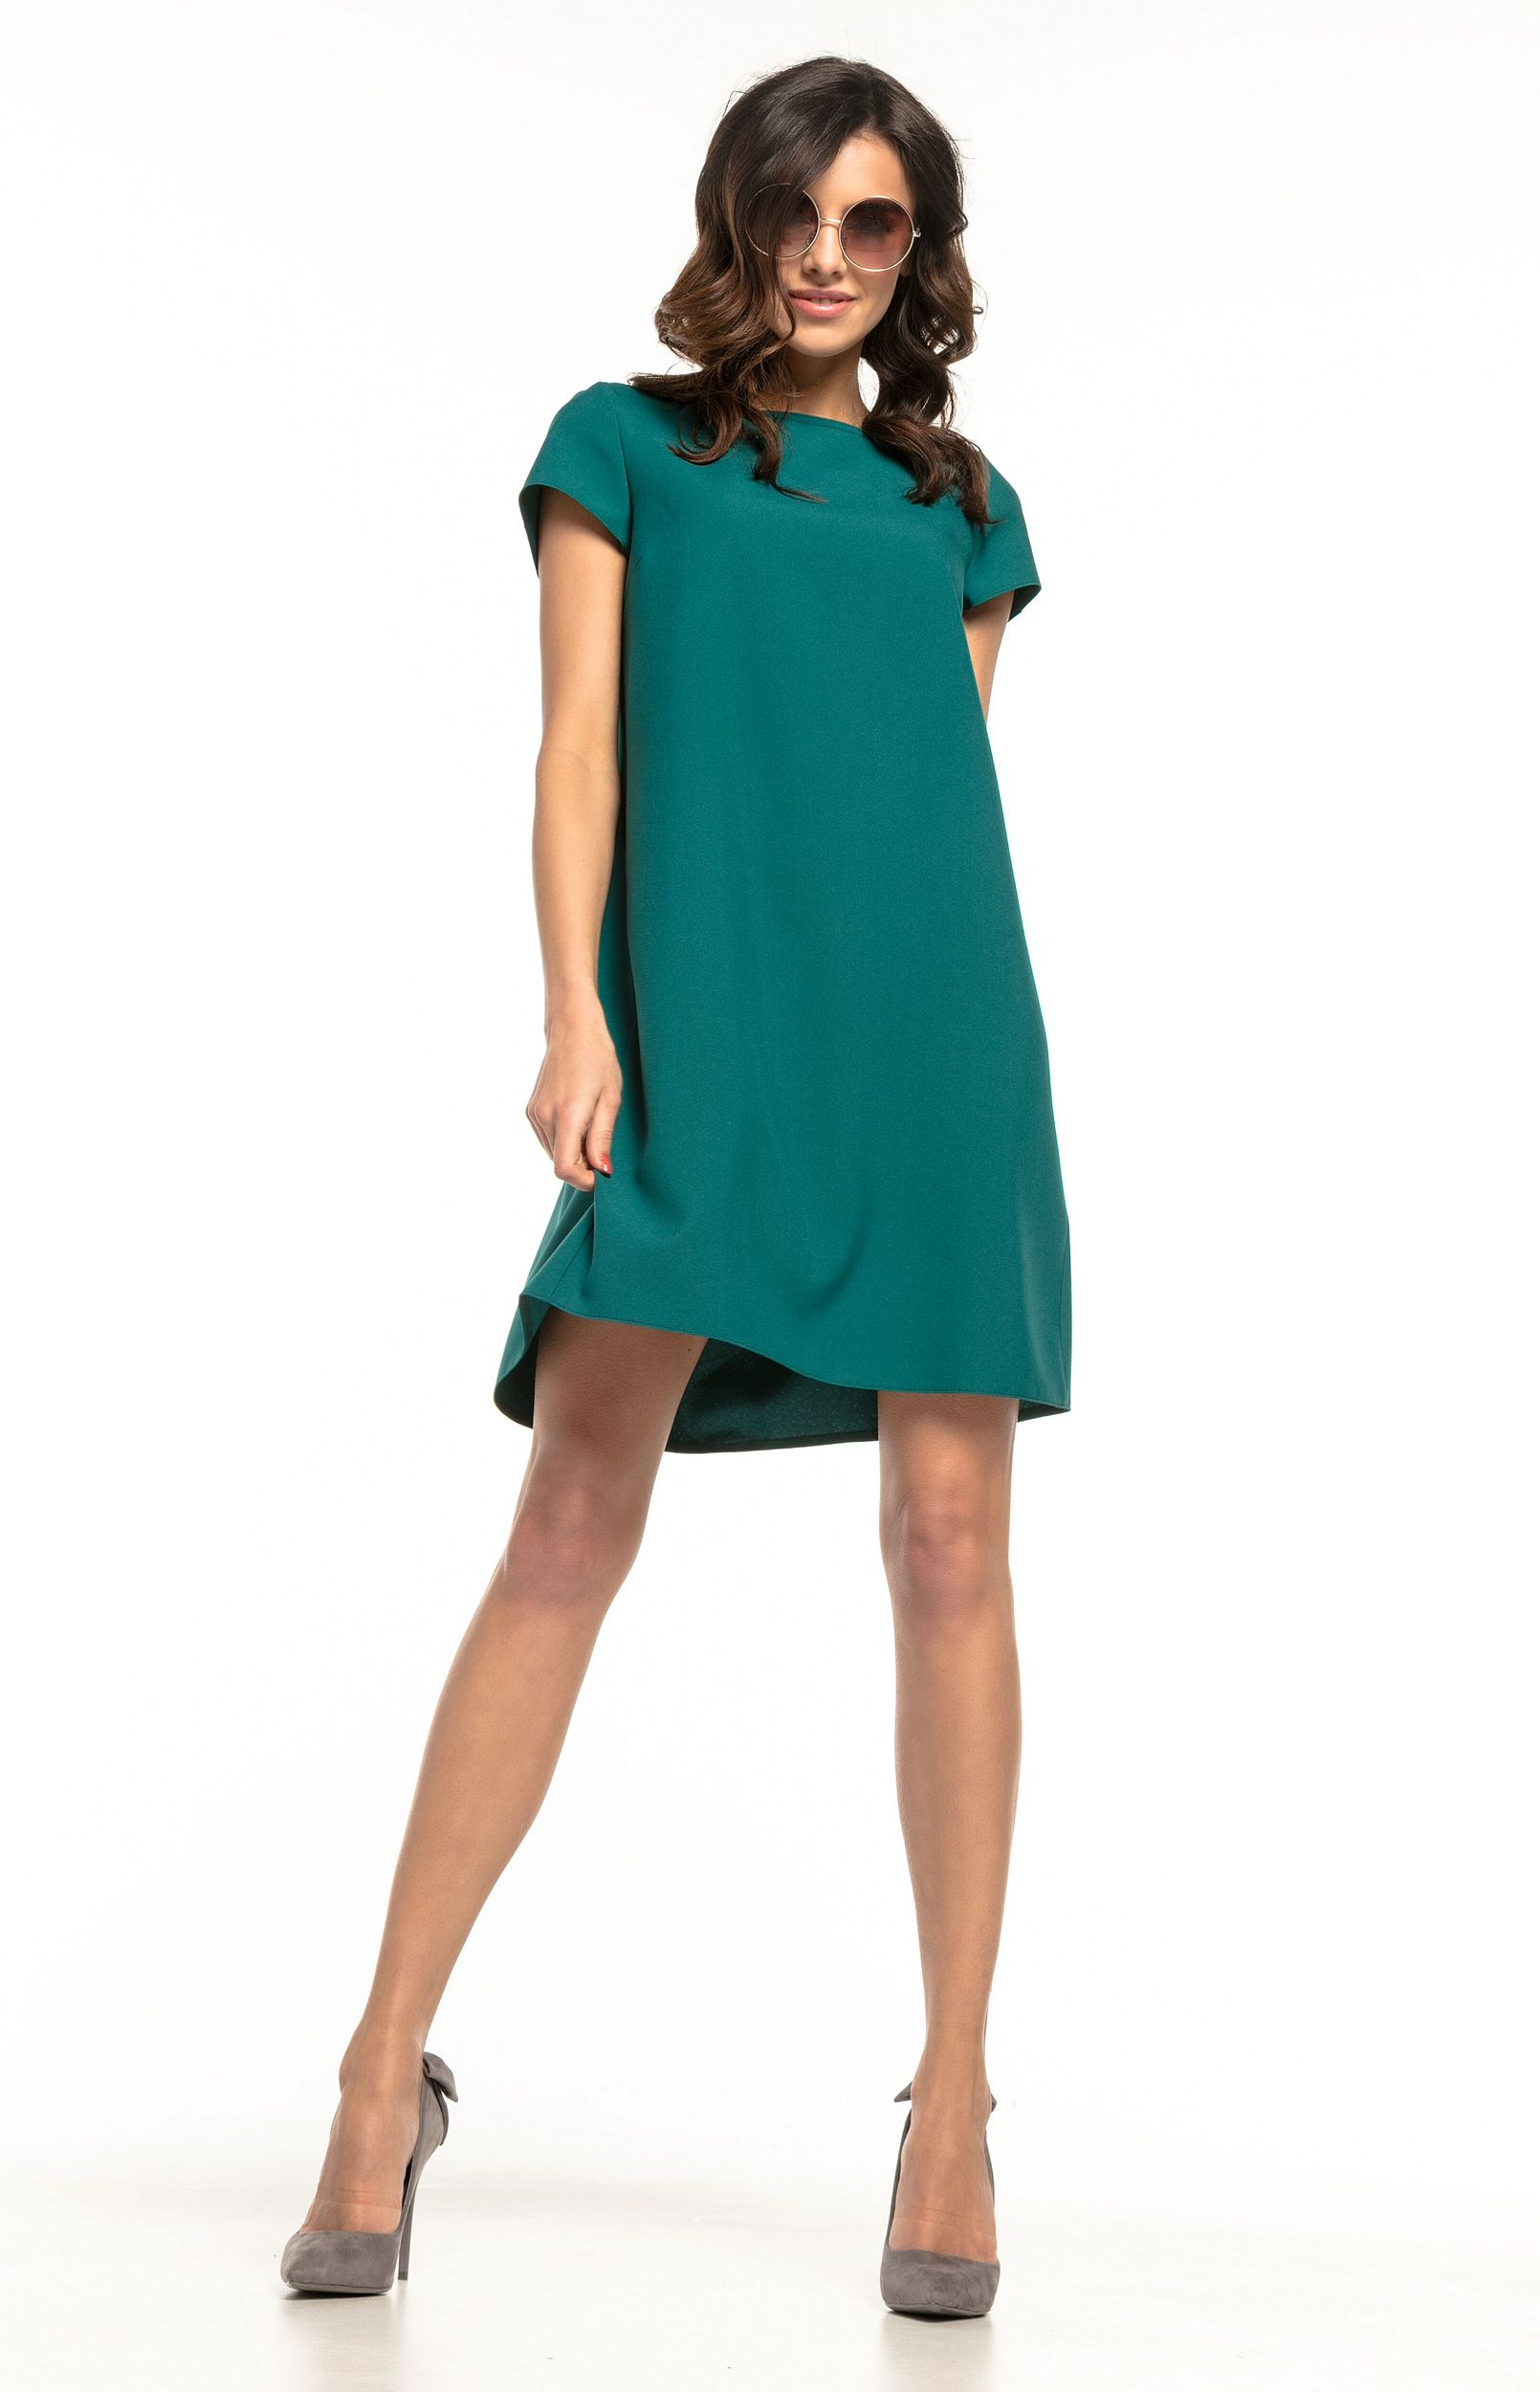 bbcf8f53f7c Robe ample courte verte Tess T261V   idresstocode  boutique de ...